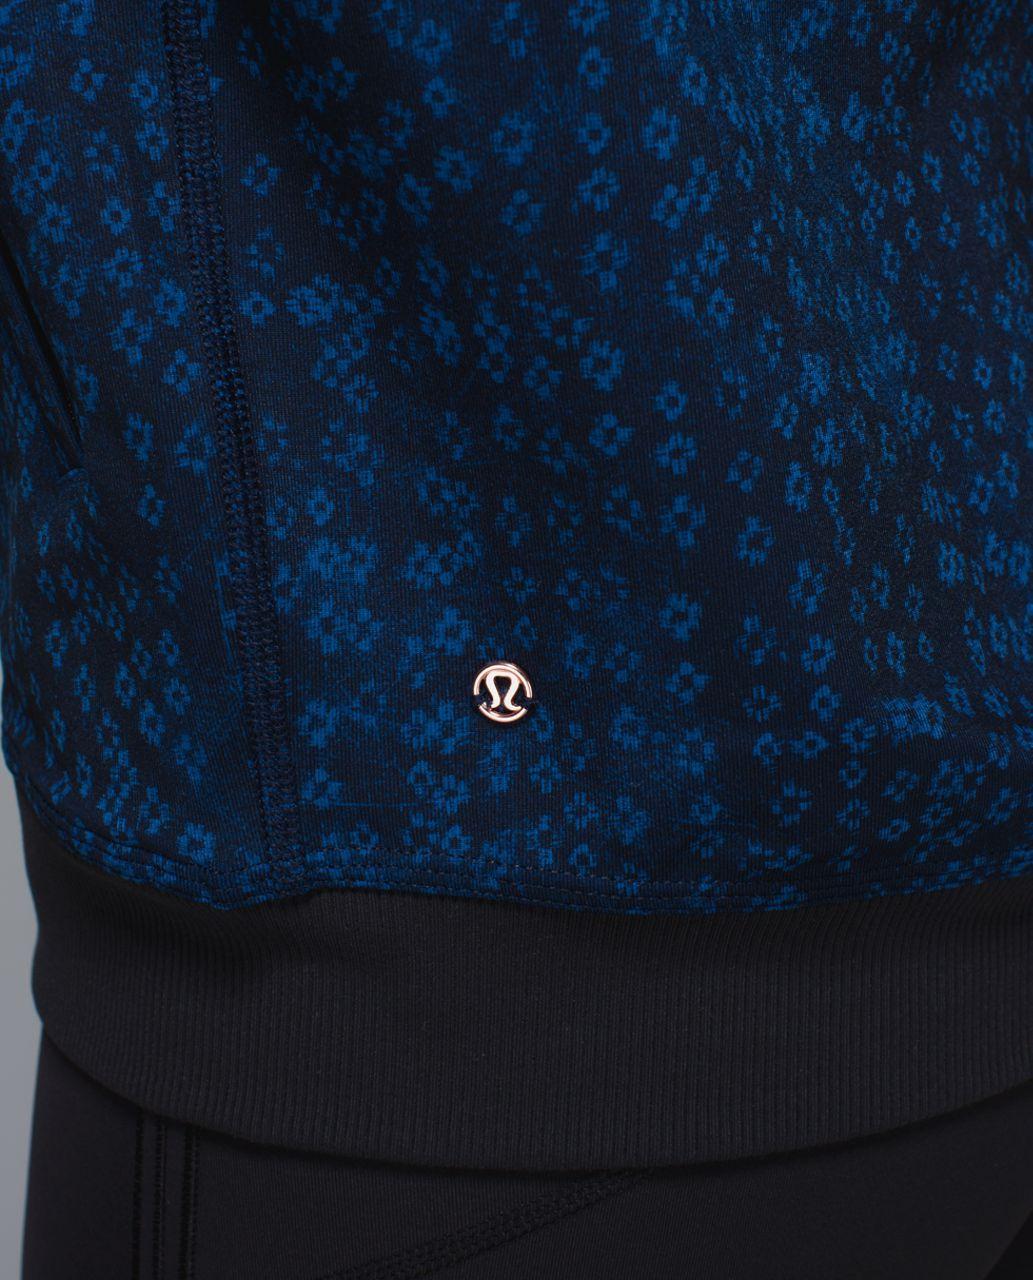 Lululemon H'Om Run Jacket - Kanoko Twist Inkwell Rugged Blue / Sashico Cross Inkwell Rugged Blue / Black